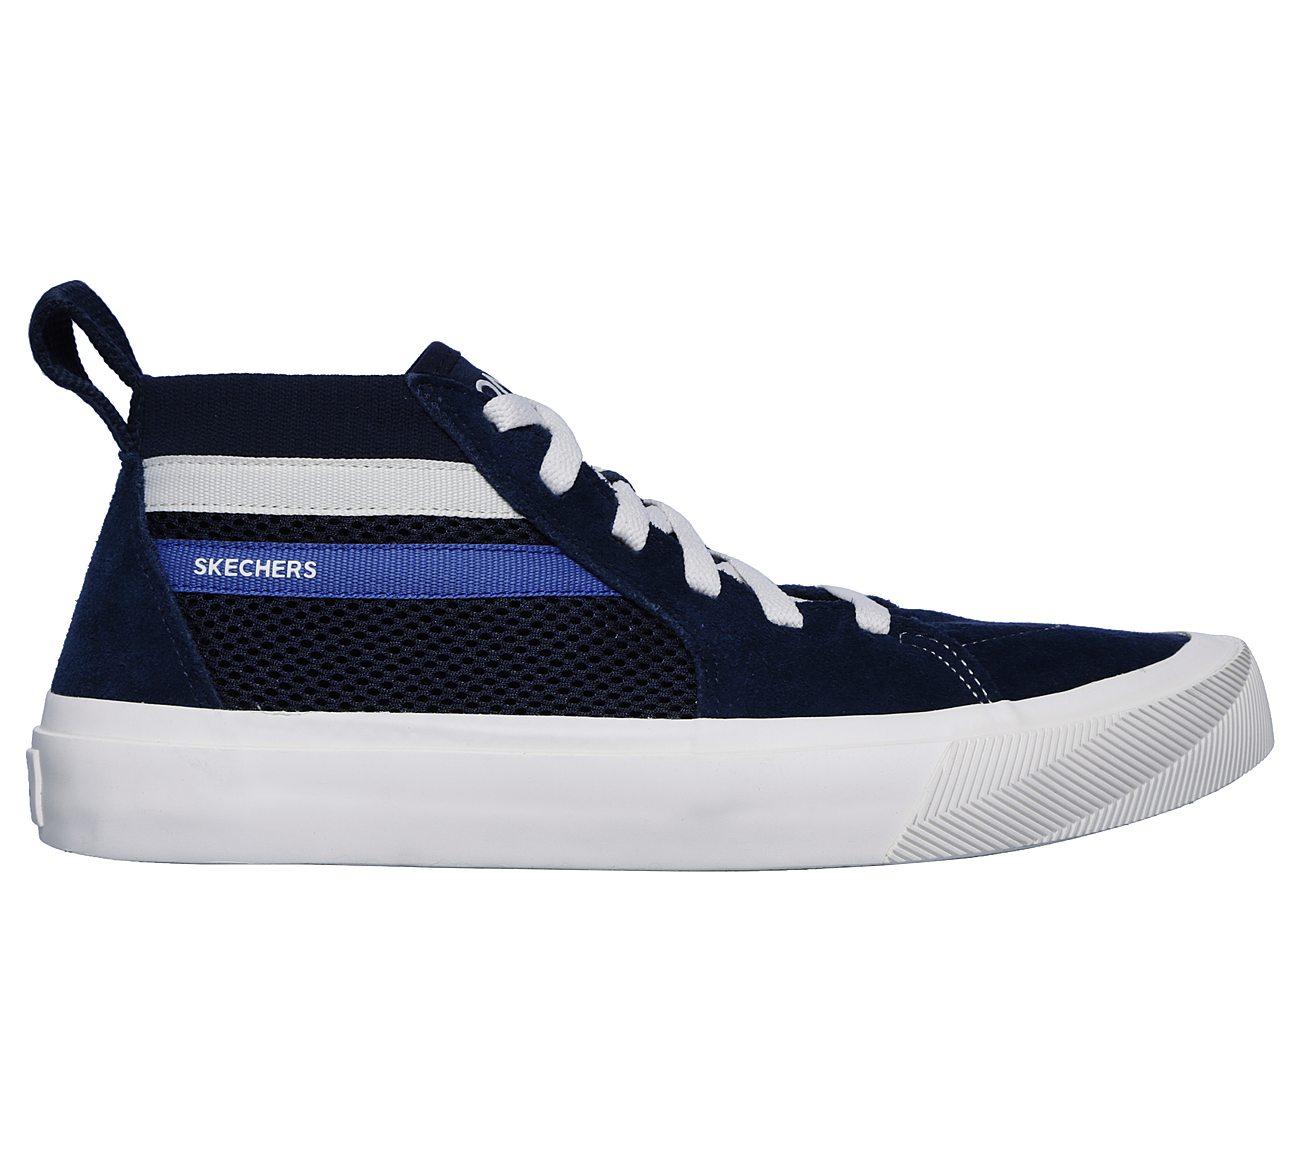 ffd13c69ec16a Buy SKECHERS Skechers ONE Champ Ultra Skechers ONE Shoes only  70.00